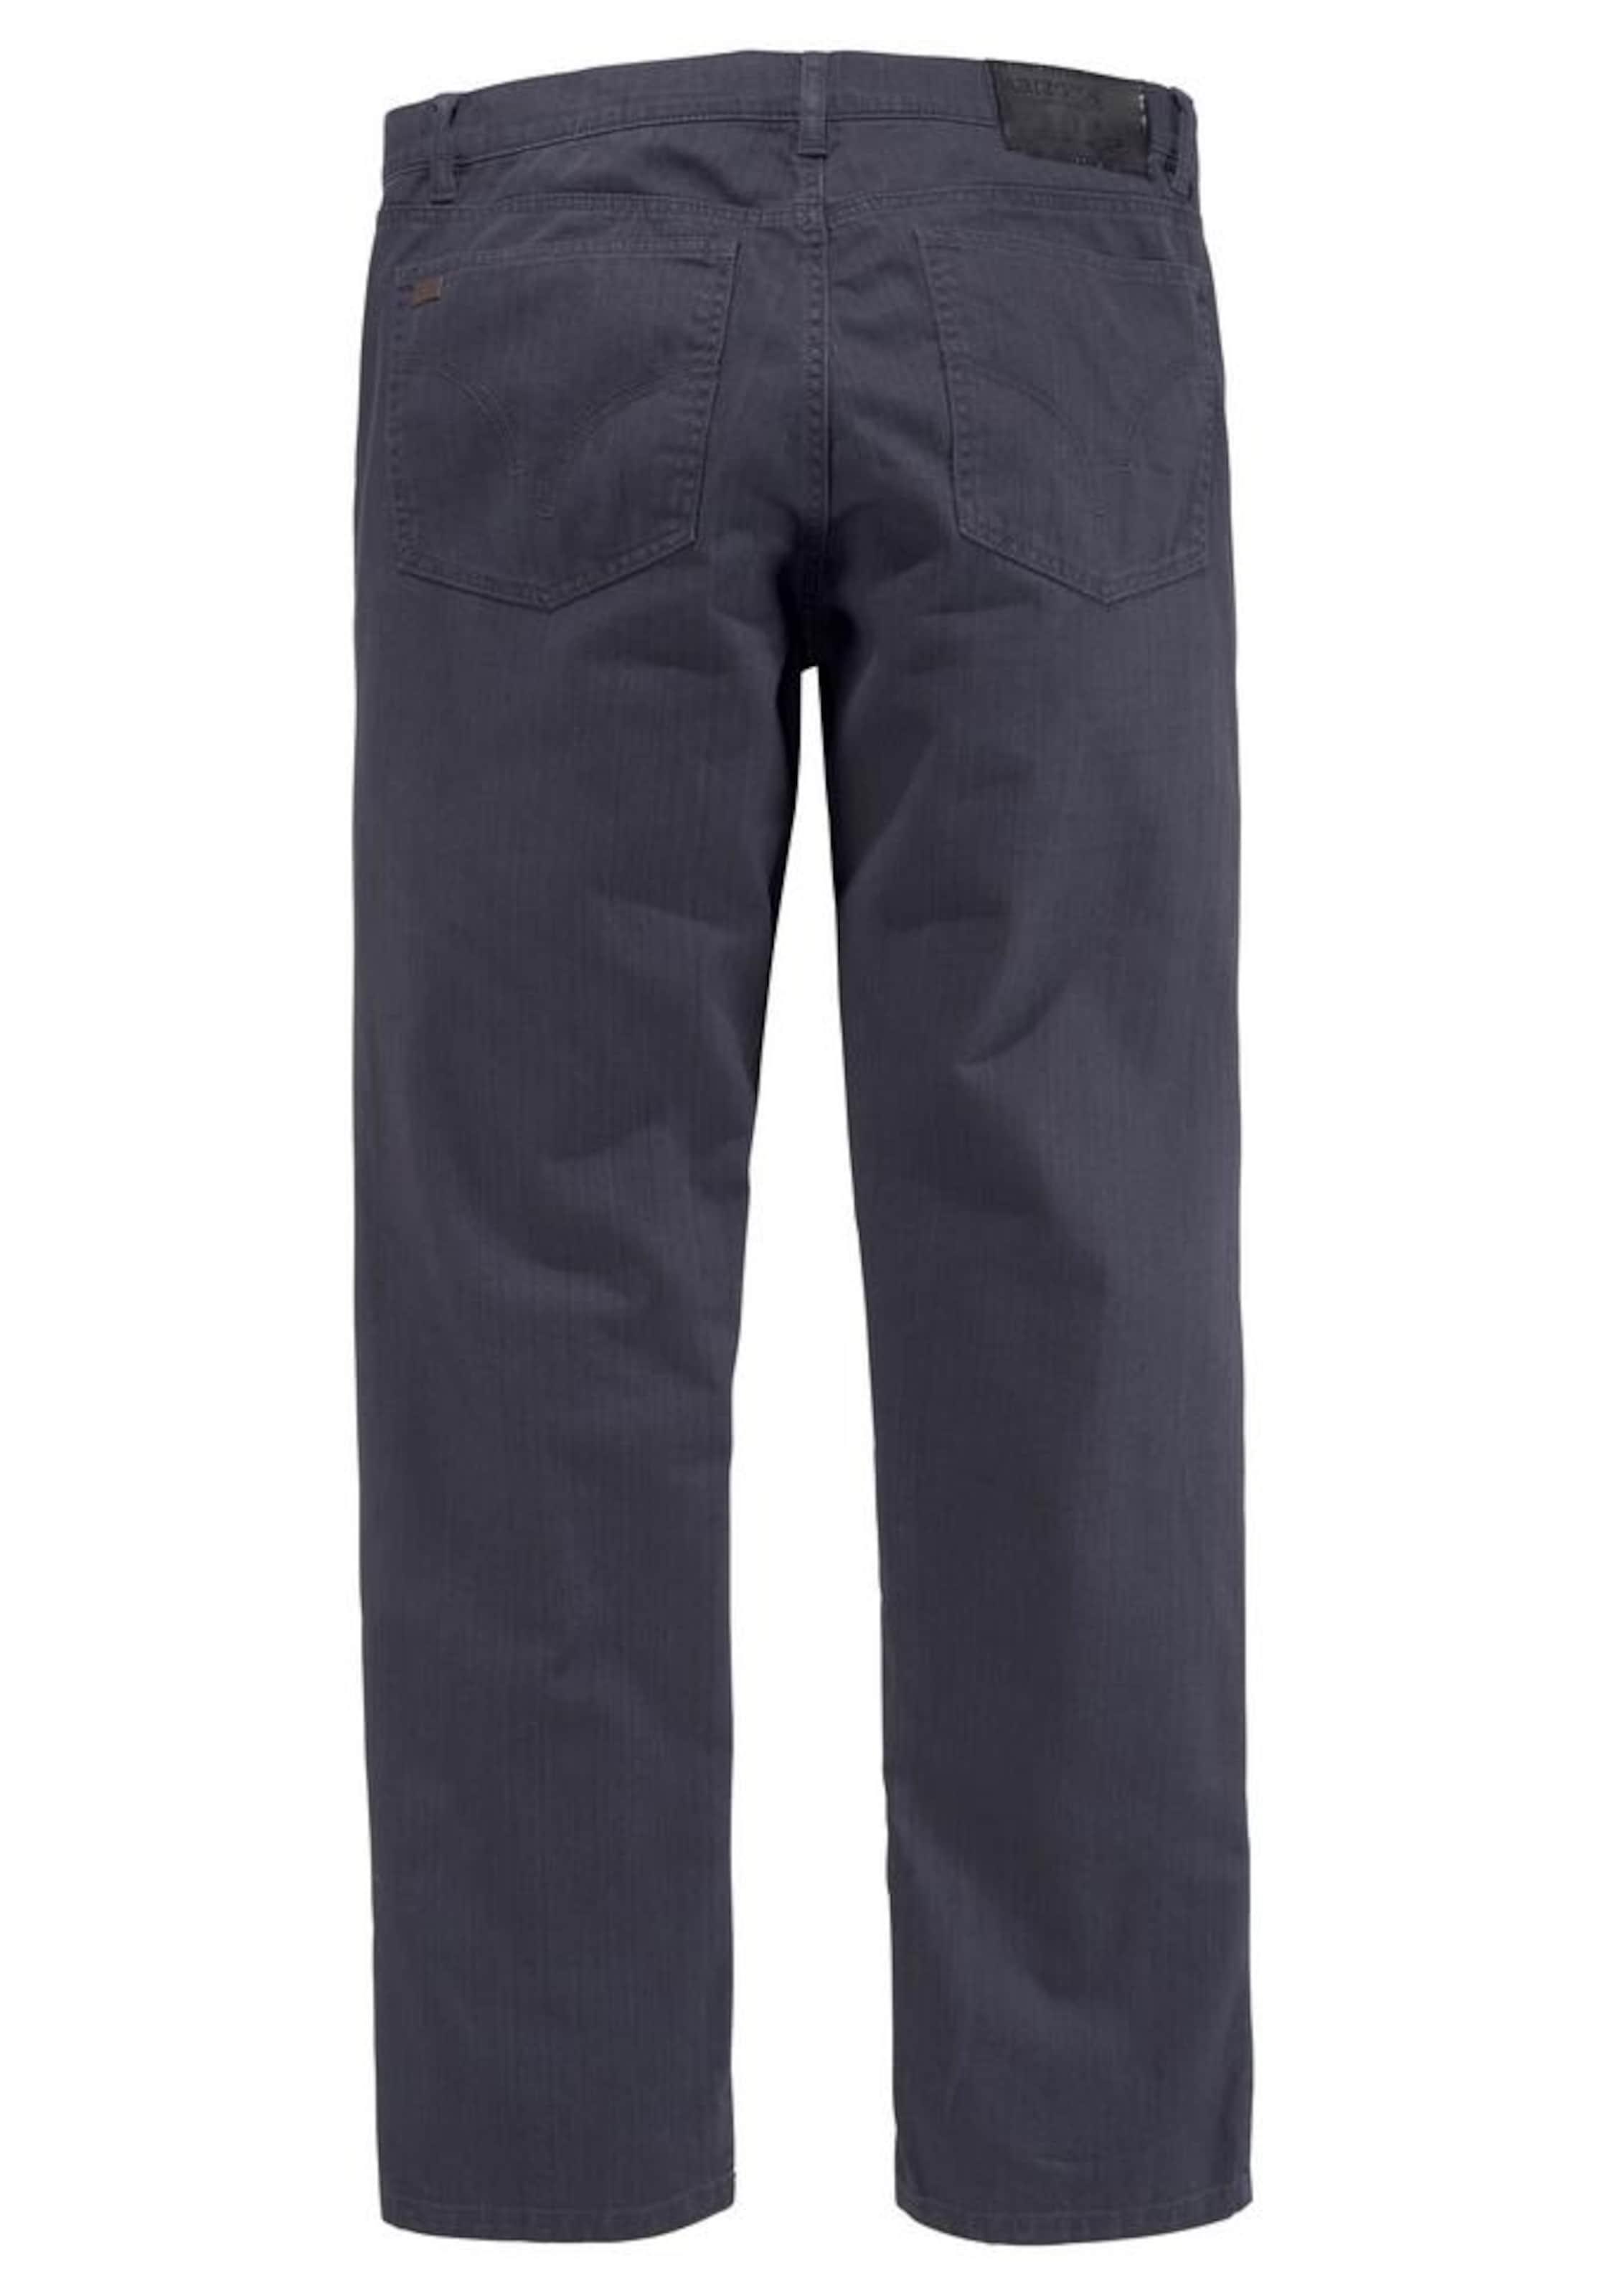 Arizona Arizona Jeans Jeans In 'harry' Dunkelblau nwP8Ok0